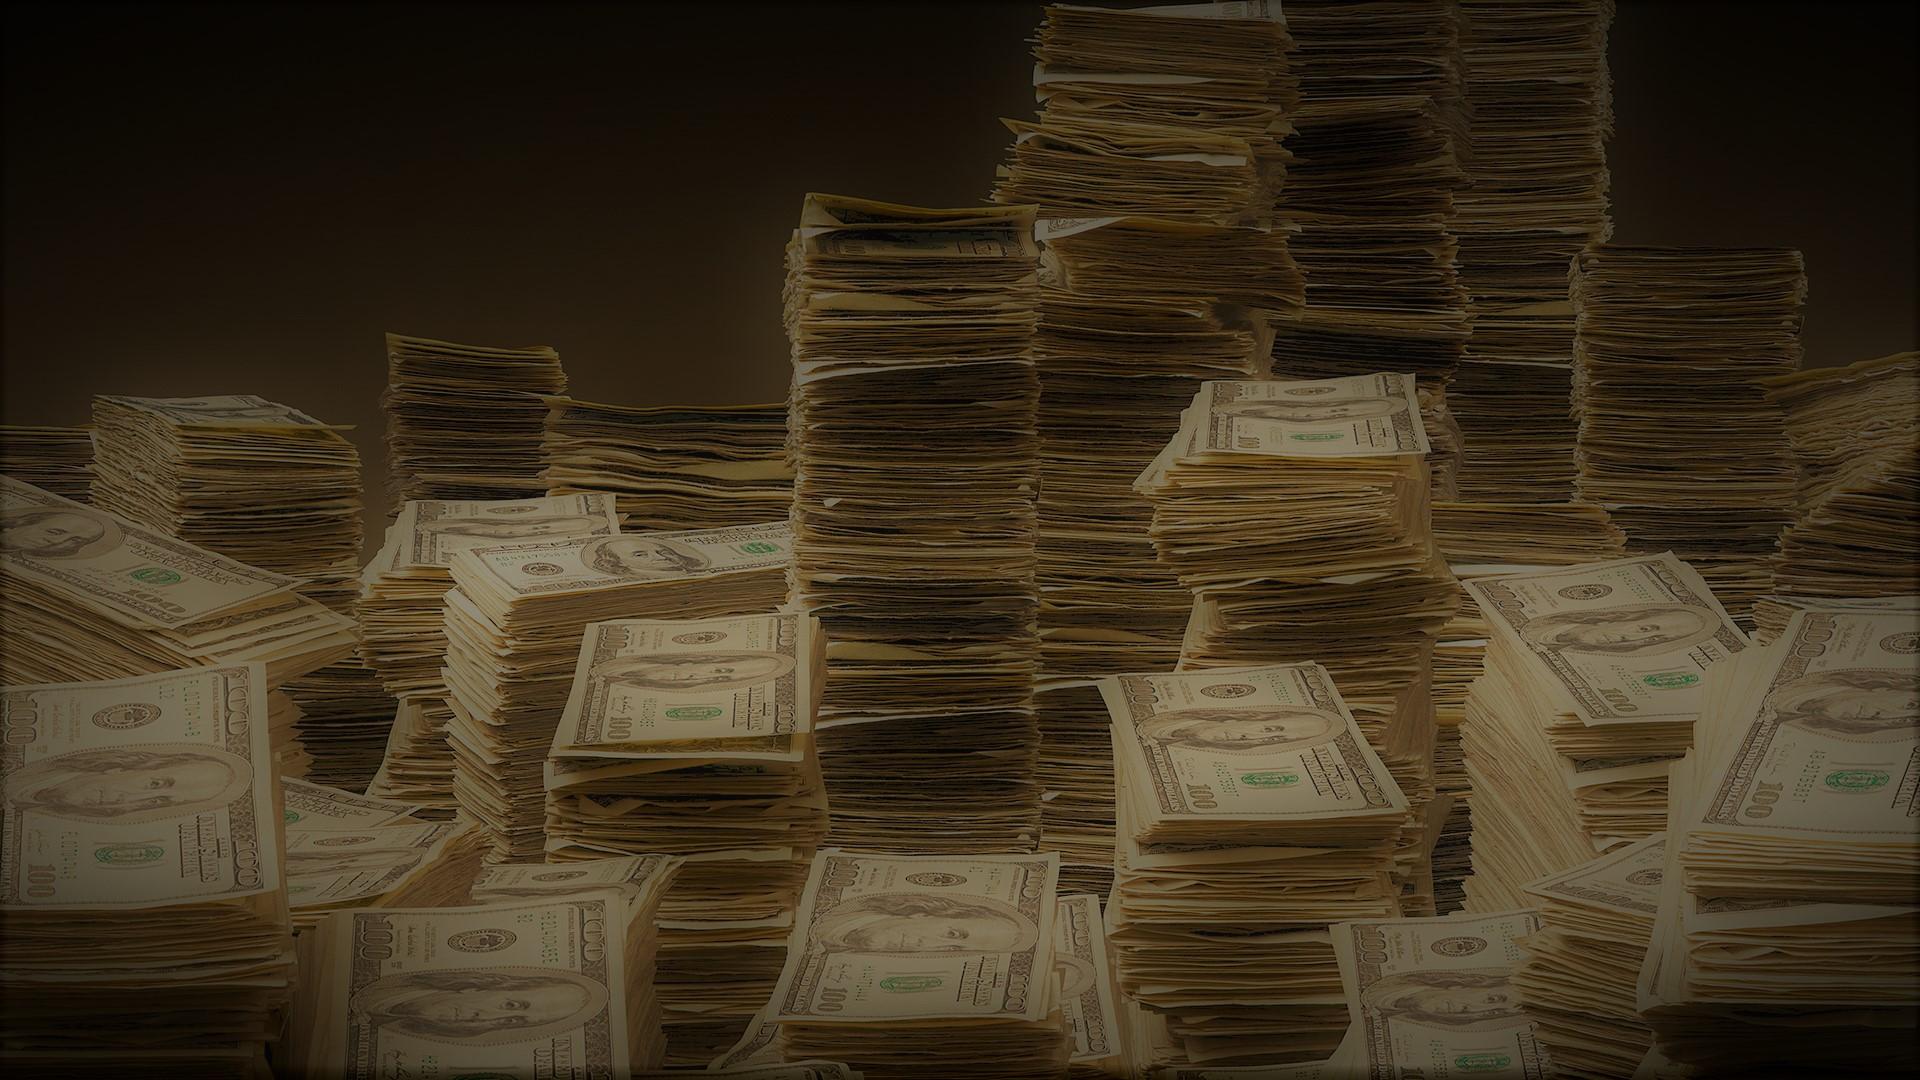 cash-money-stacks-wallpaper-49517-51192-hd-wallpapers.jpg